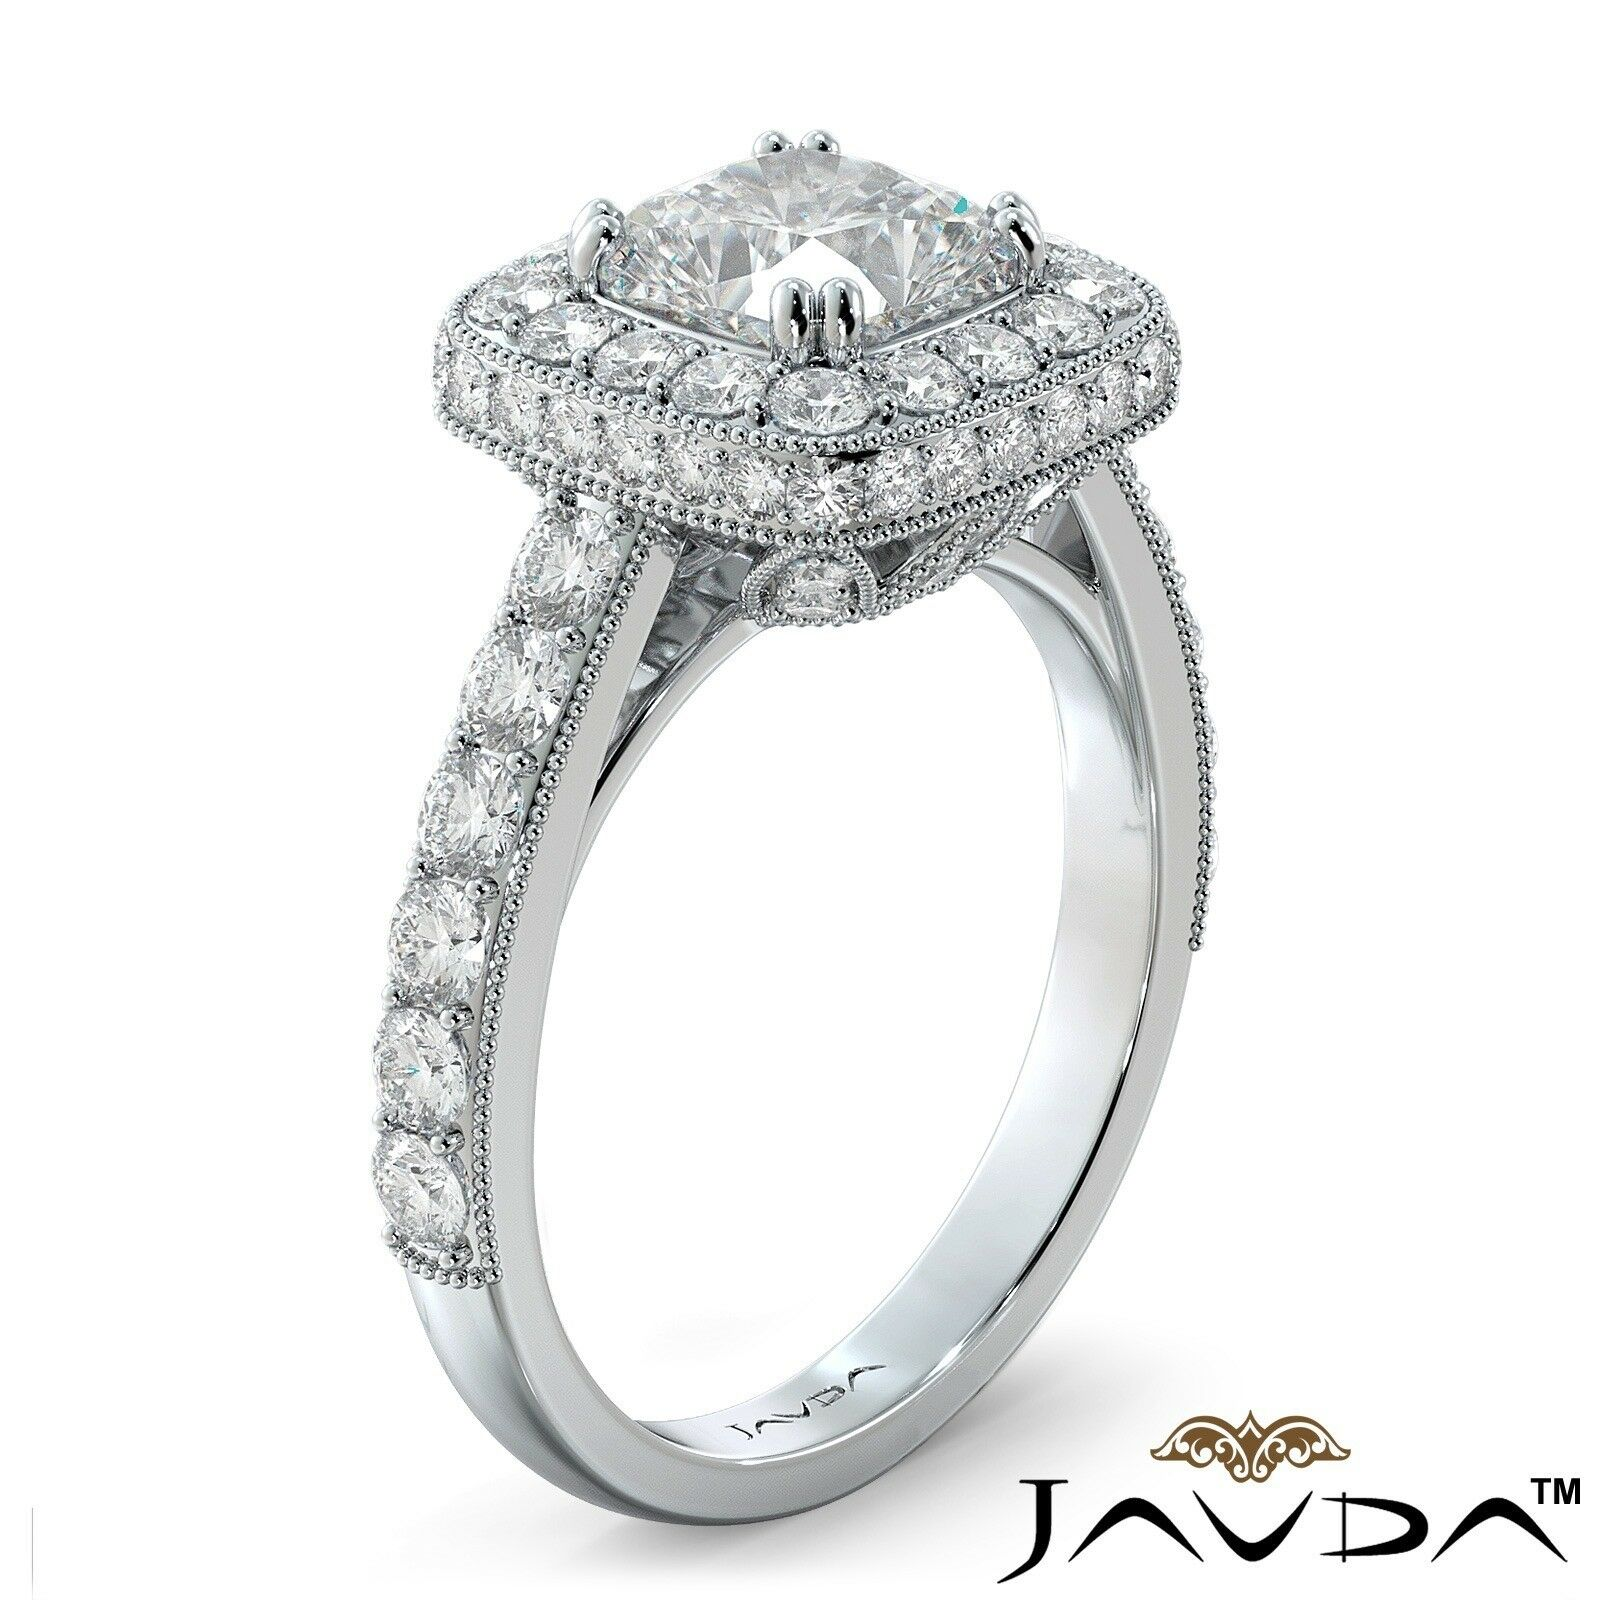 2.12ctw Milgrain Floral Basket Cushion Diamond Engagement Ring GIA I-SI2 W Gold 1